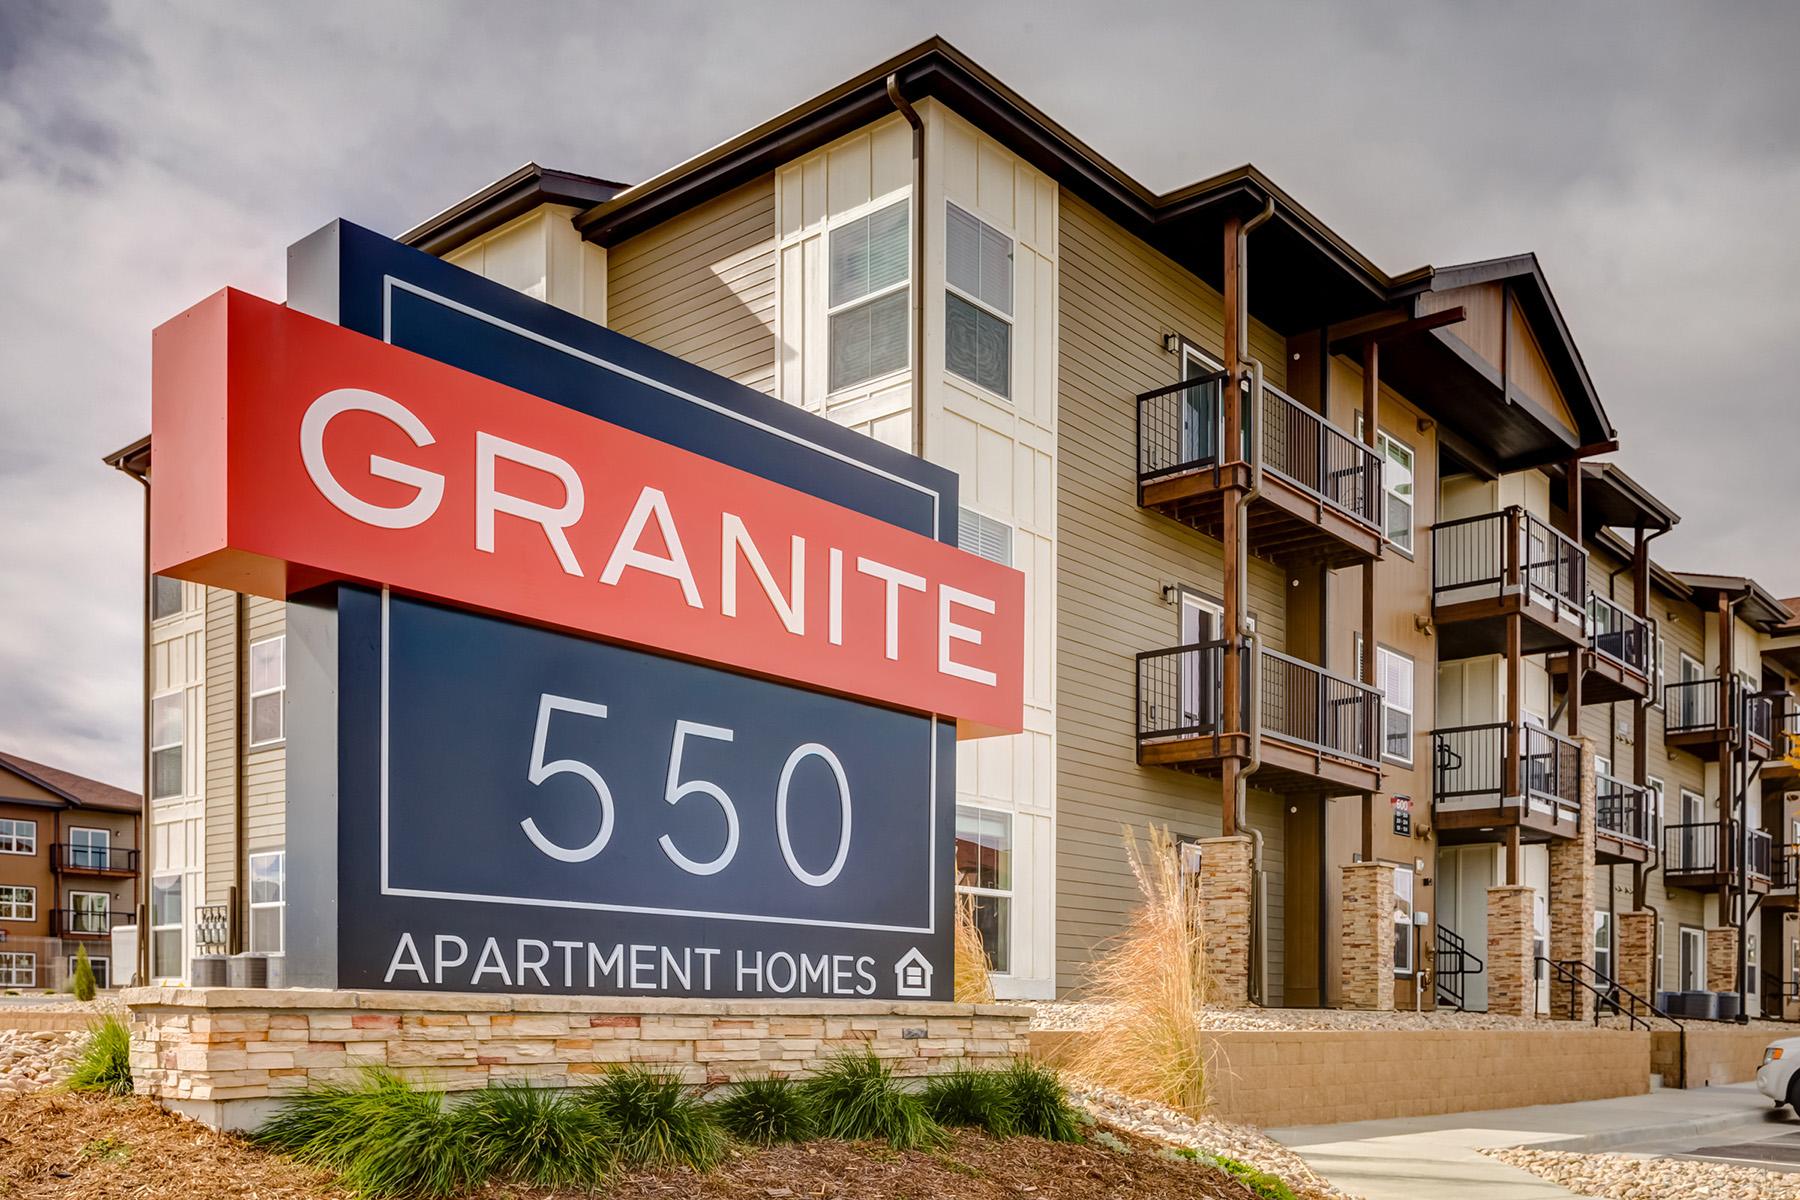 Apartments casper wy granite 550 gallery - 3 bedroom house rentals casper wy ...